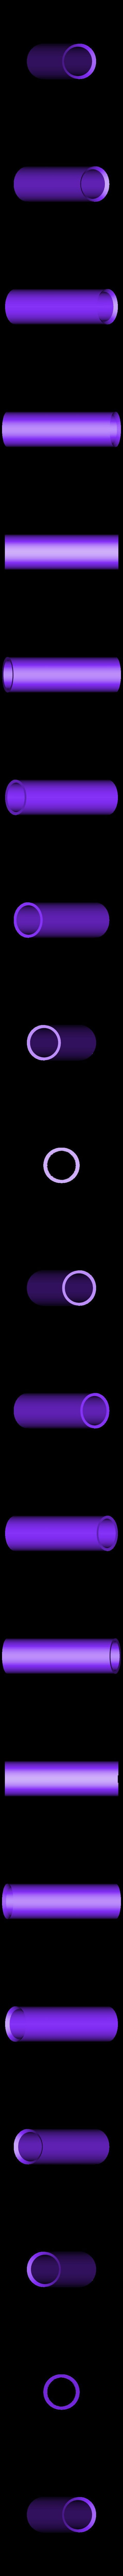 Filament_Cartriage_Cylinder.stl Download free STL file  DIY Airtight Spool Holder • 3D printing object, PentlandDesigns